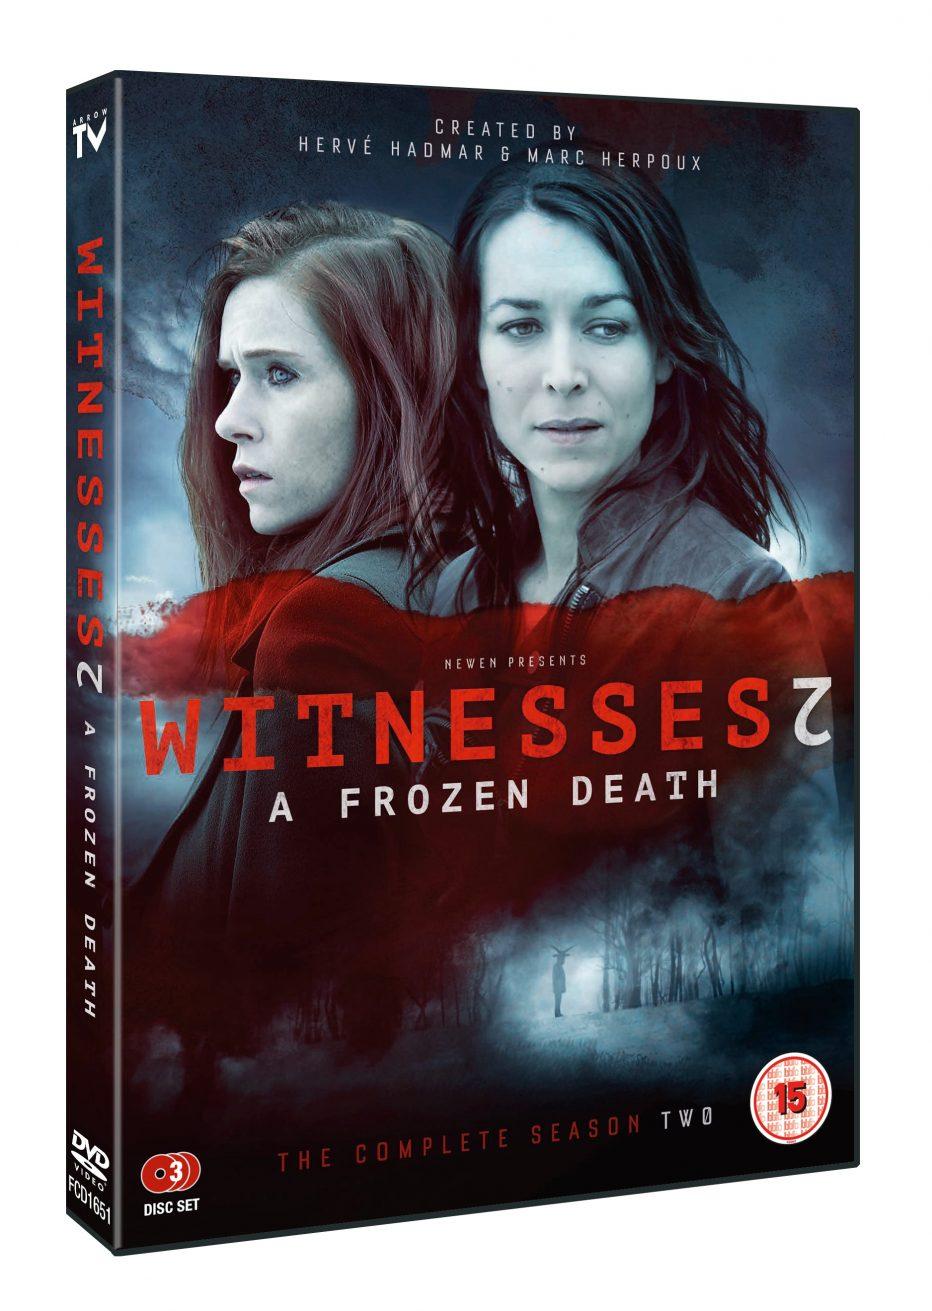 Witnesses – A Frozen Death (2017) Review